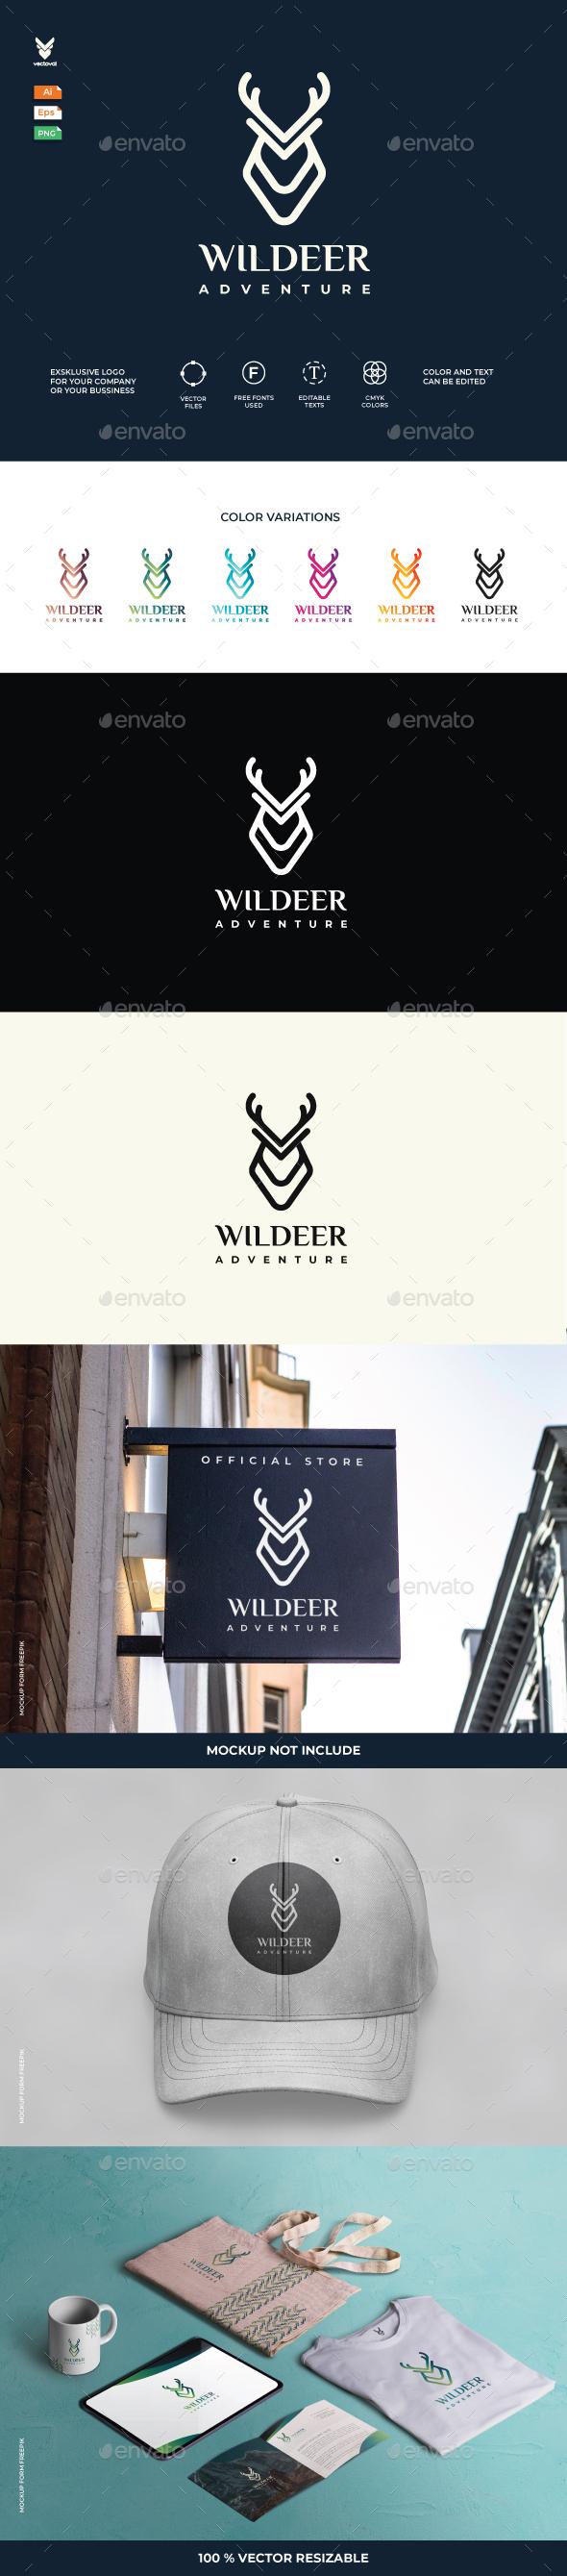 Wildeer Adventure Logo